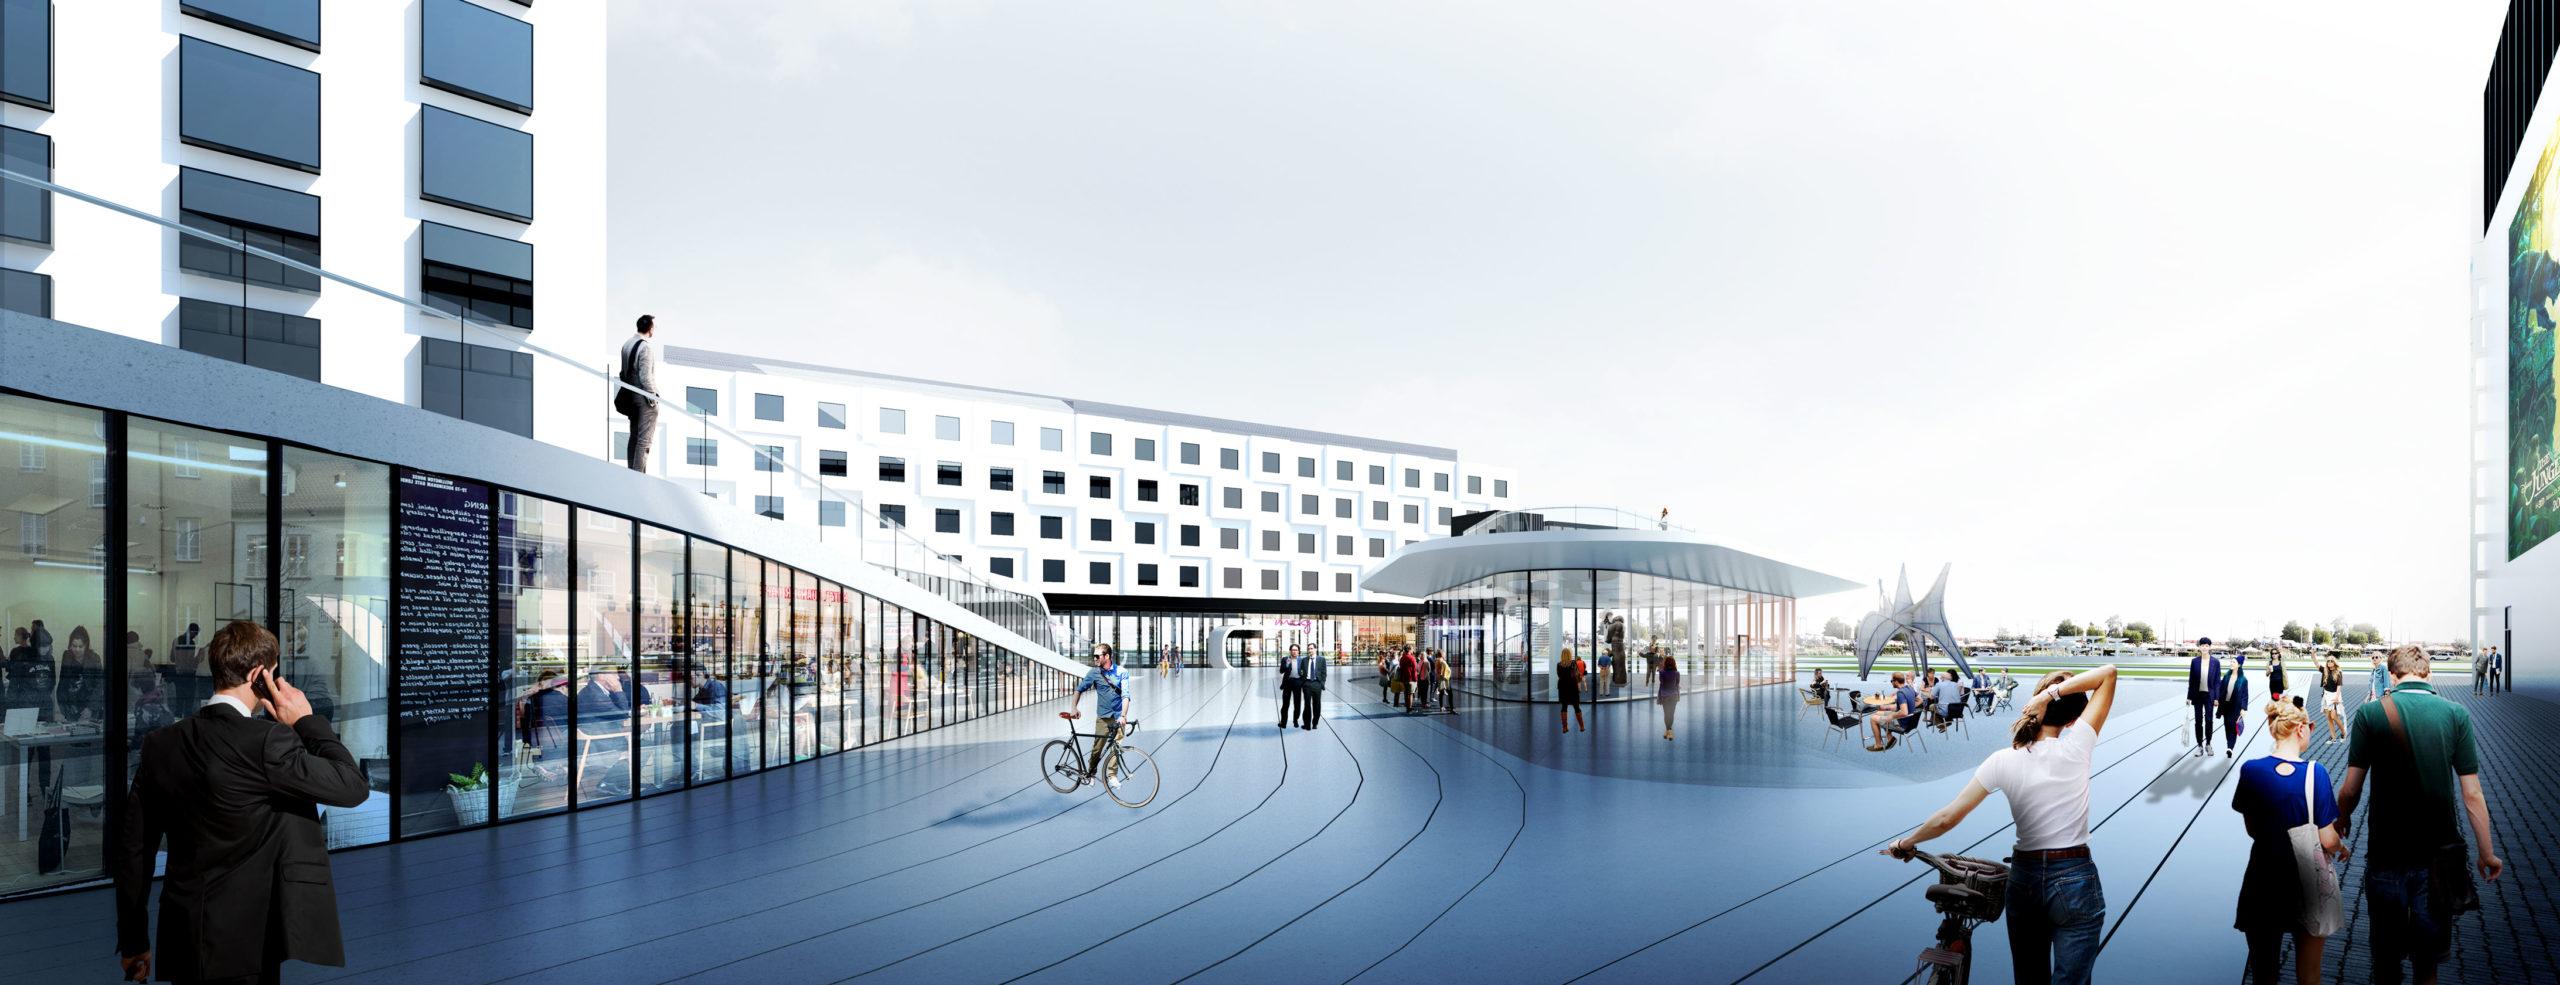 MJZ-Gdynia-Maritime-Hotels-3